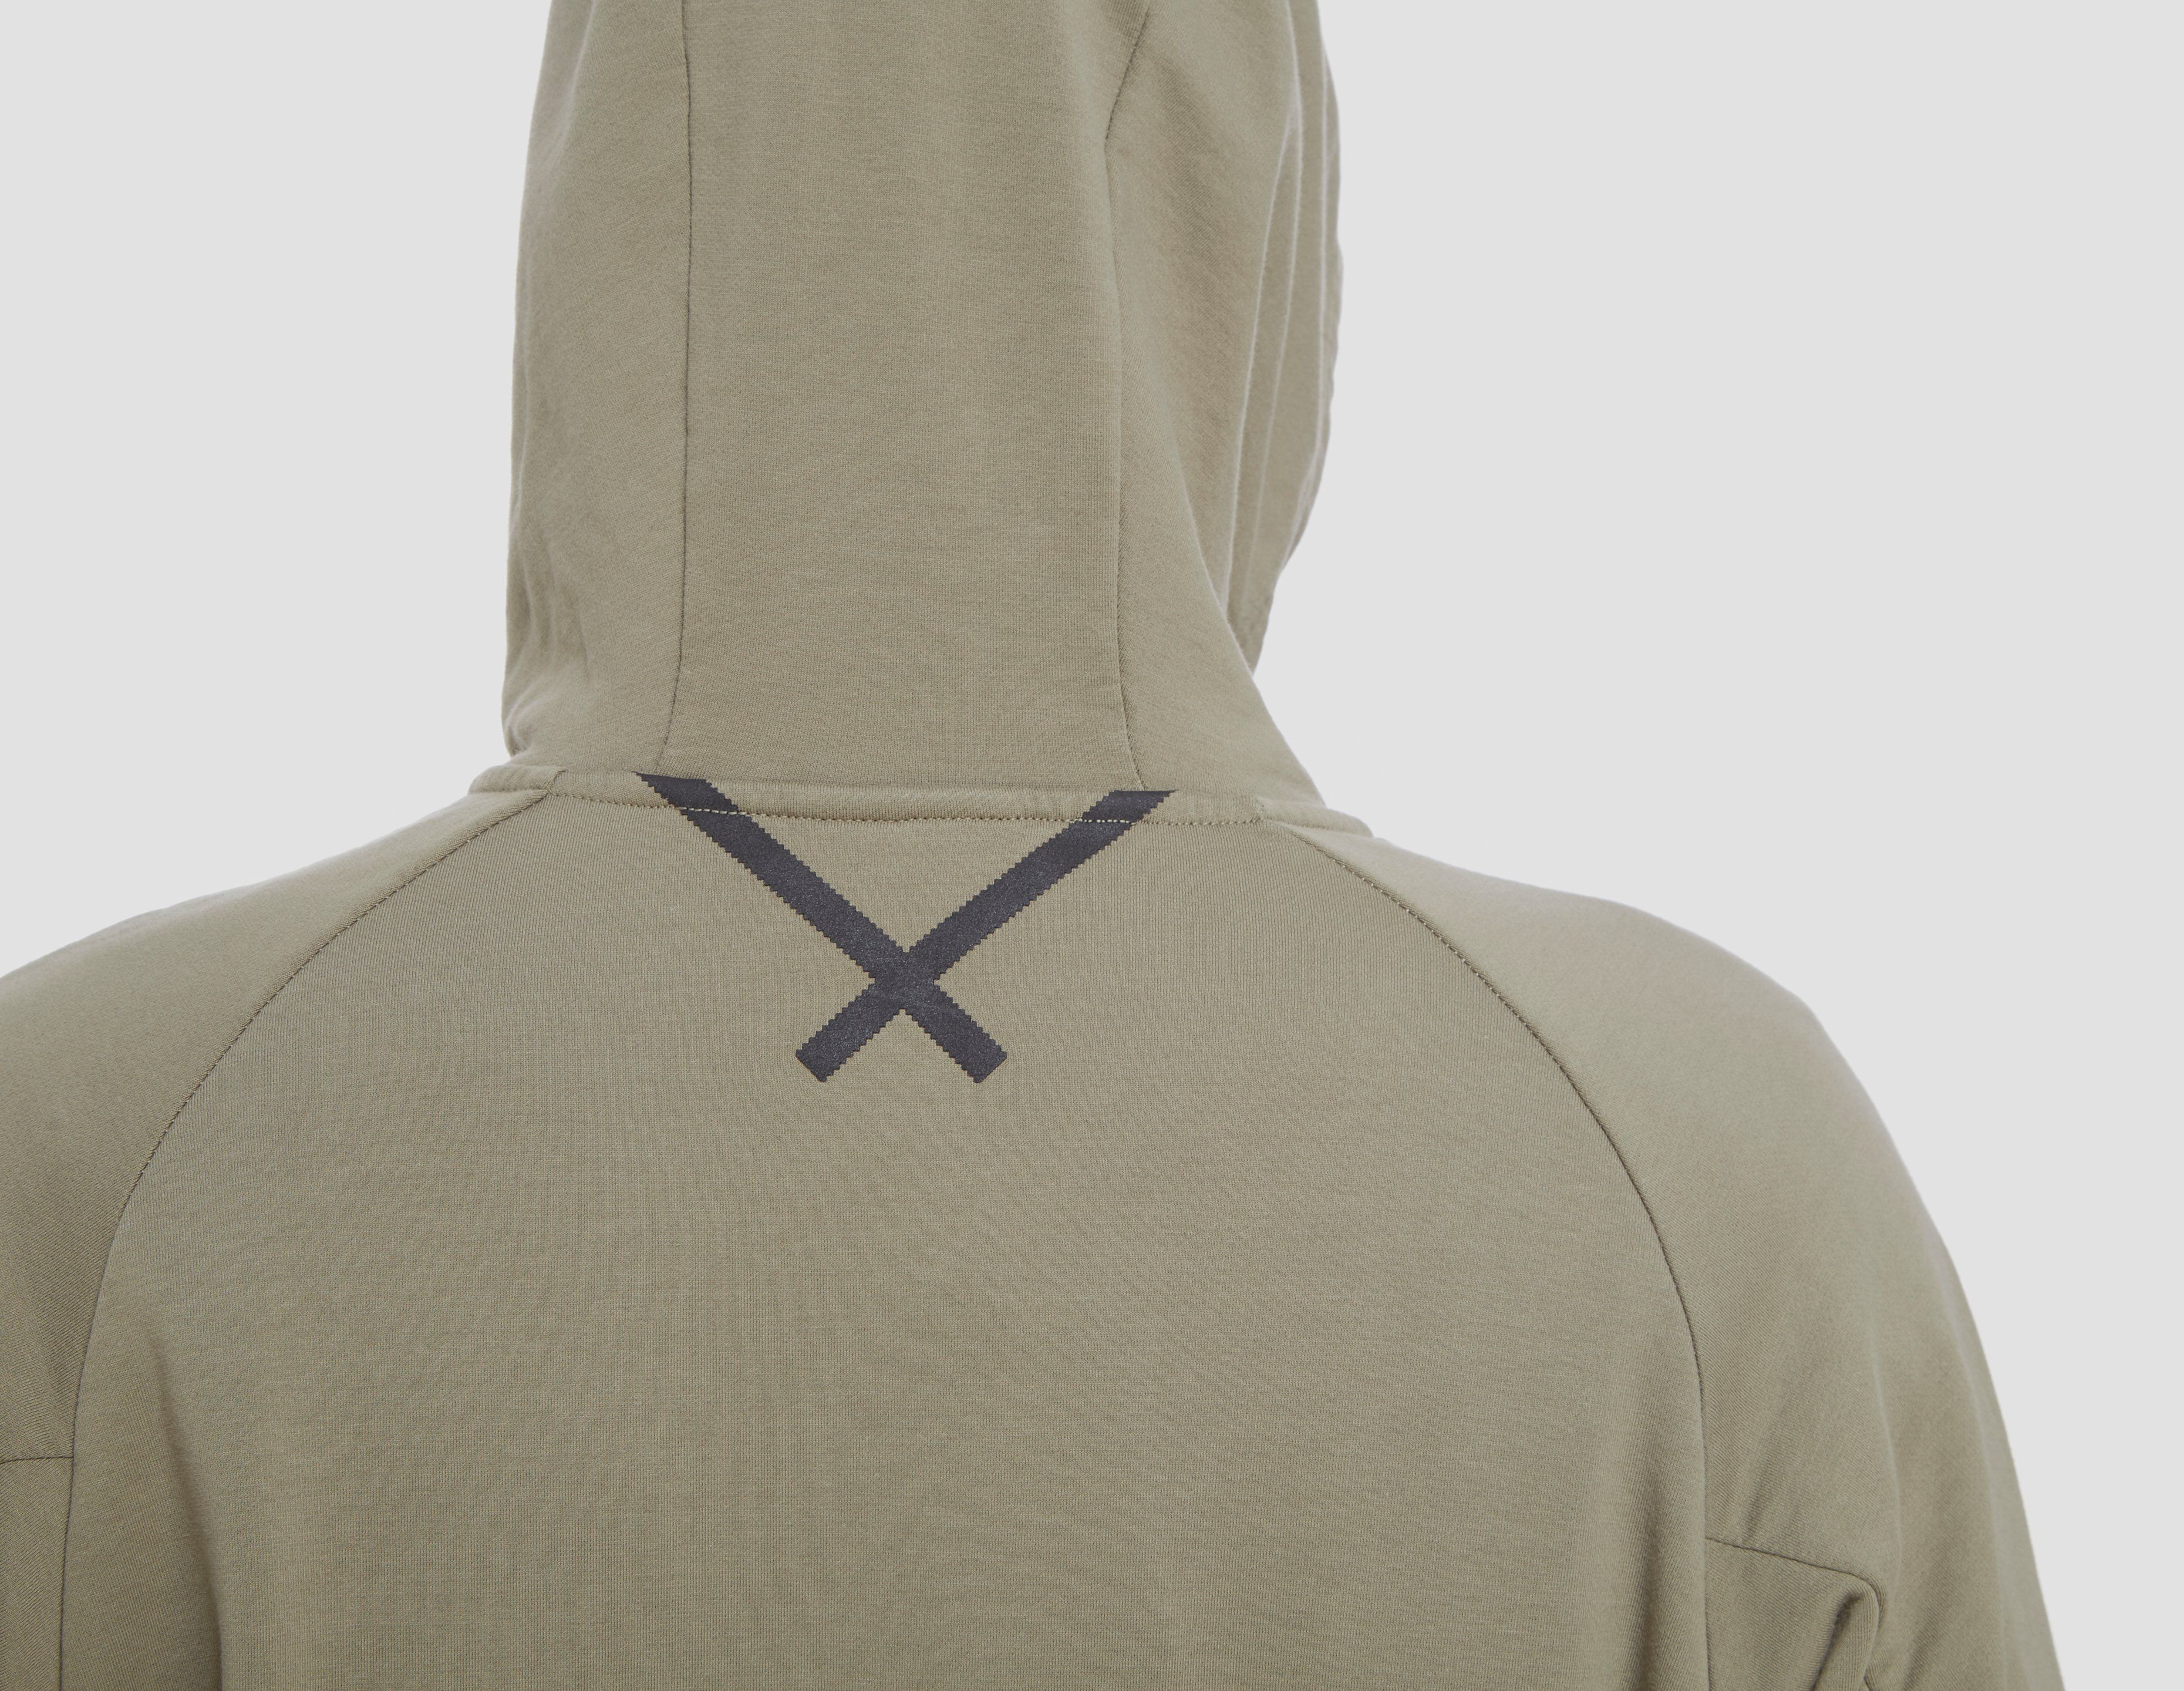 adidas Originals x Oyster Holdings XBYO Hoody